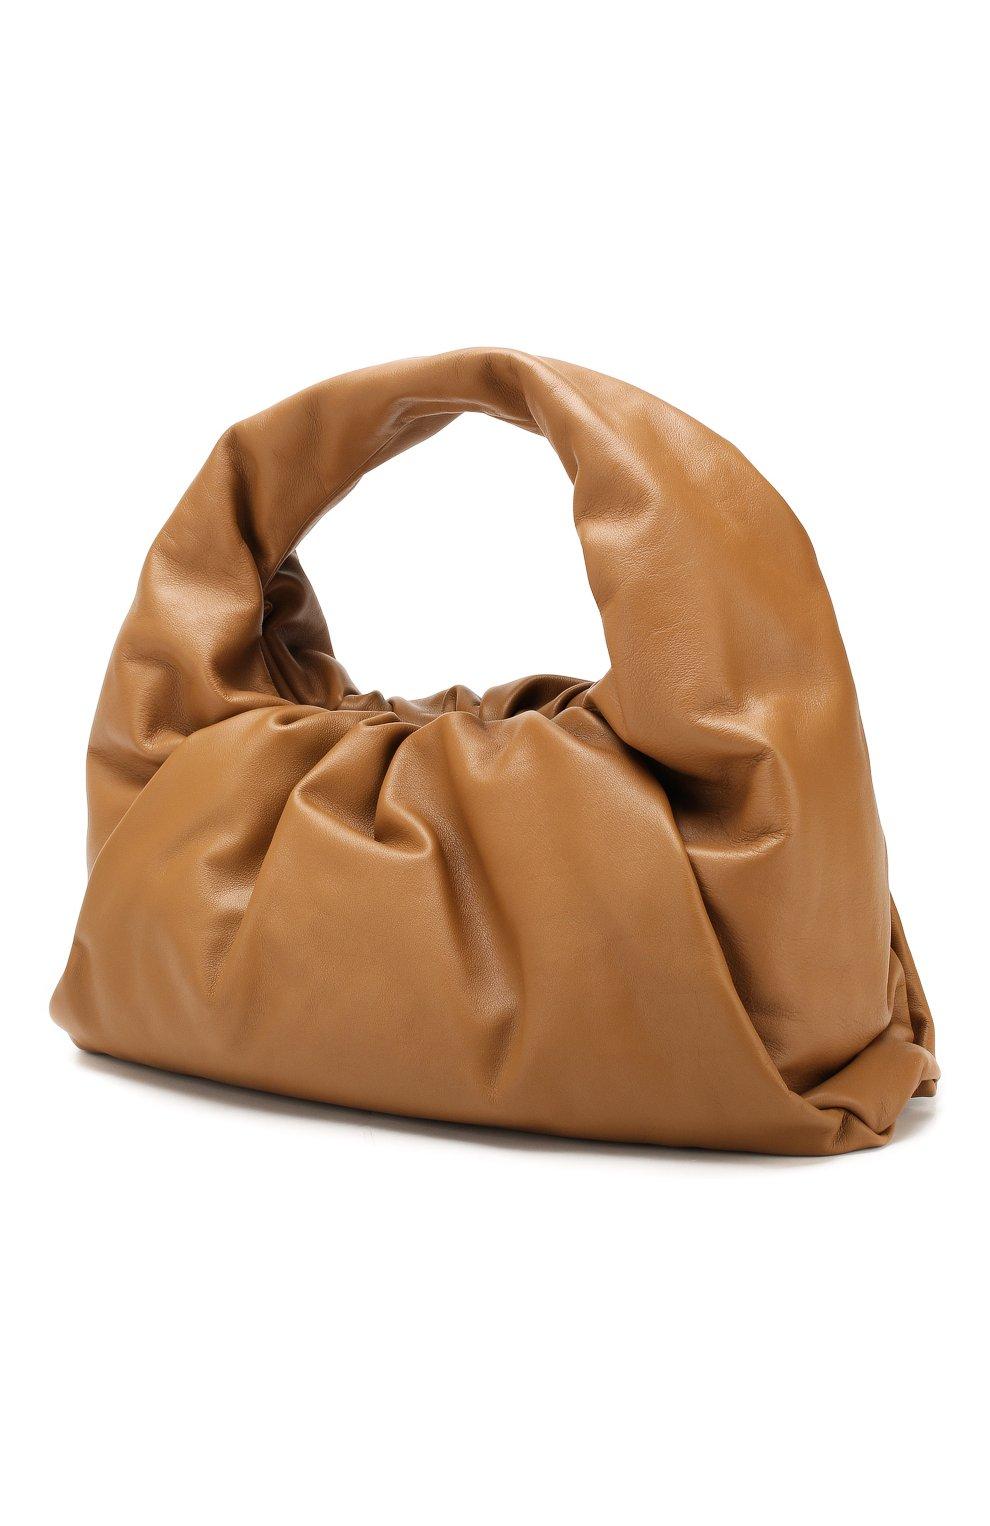 Женская сумка shoulder pouch BOTTEGA VENETA бежевого цвета, арт. 610524/VCP40   Фото 3